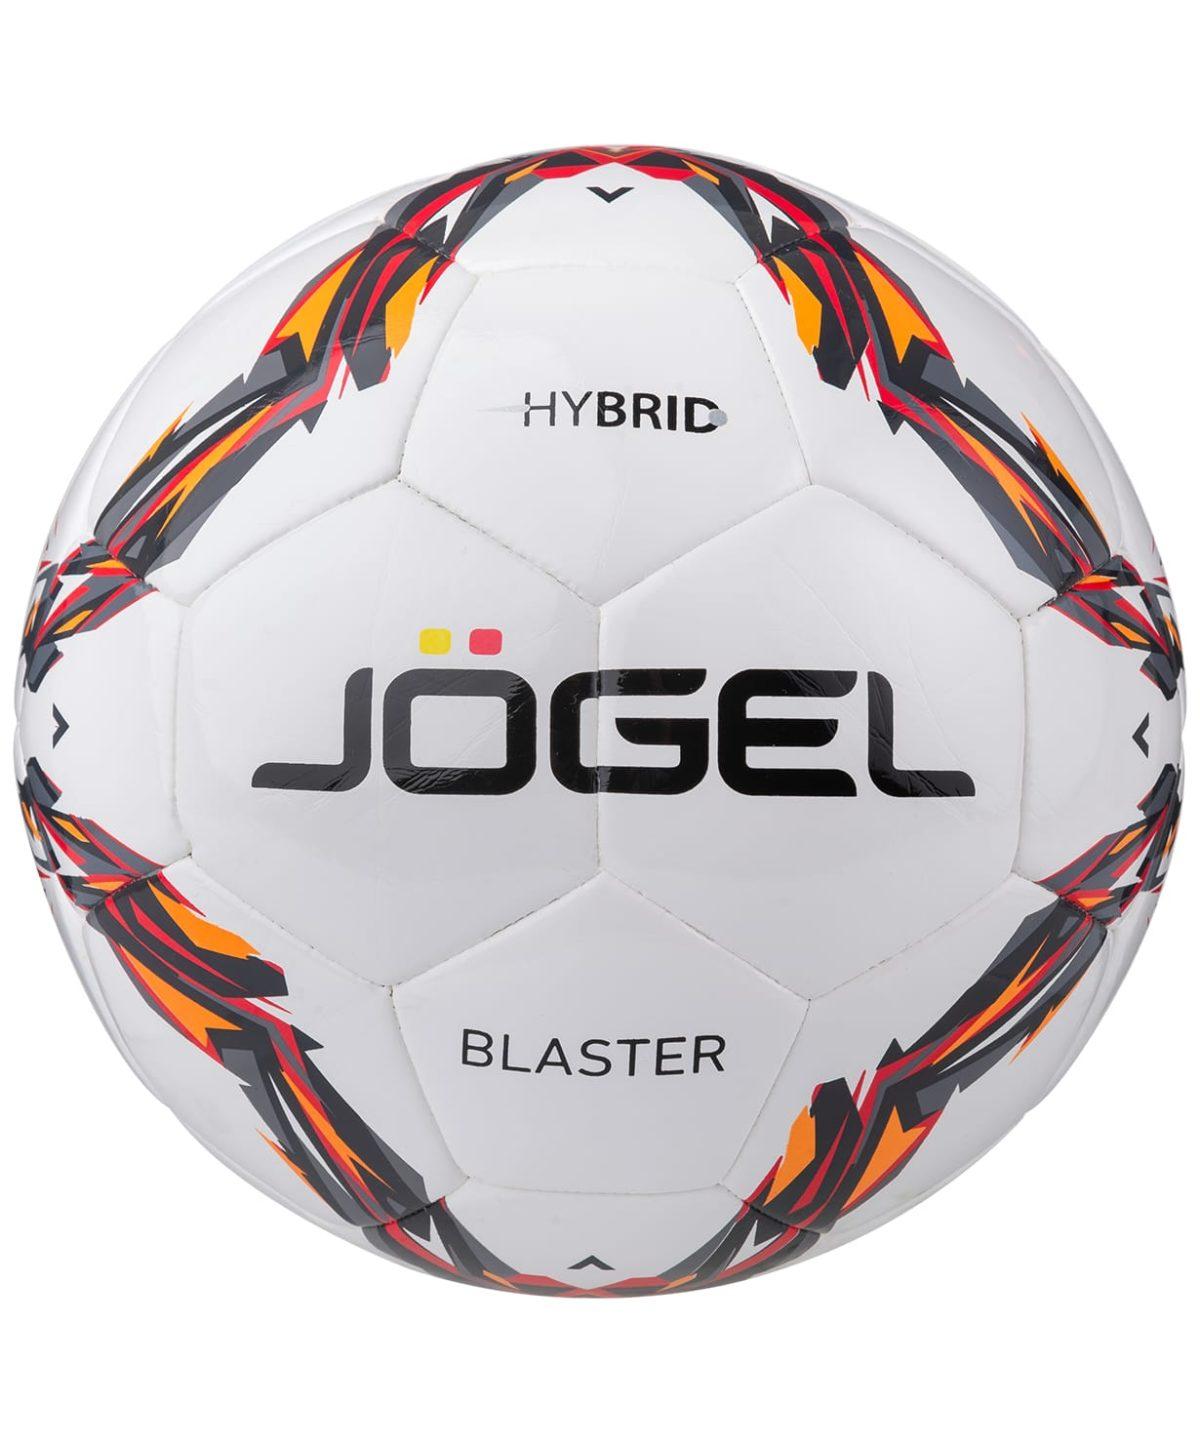 JOGEL Blaster Мяч футзальный  JF-510 №4 - 1